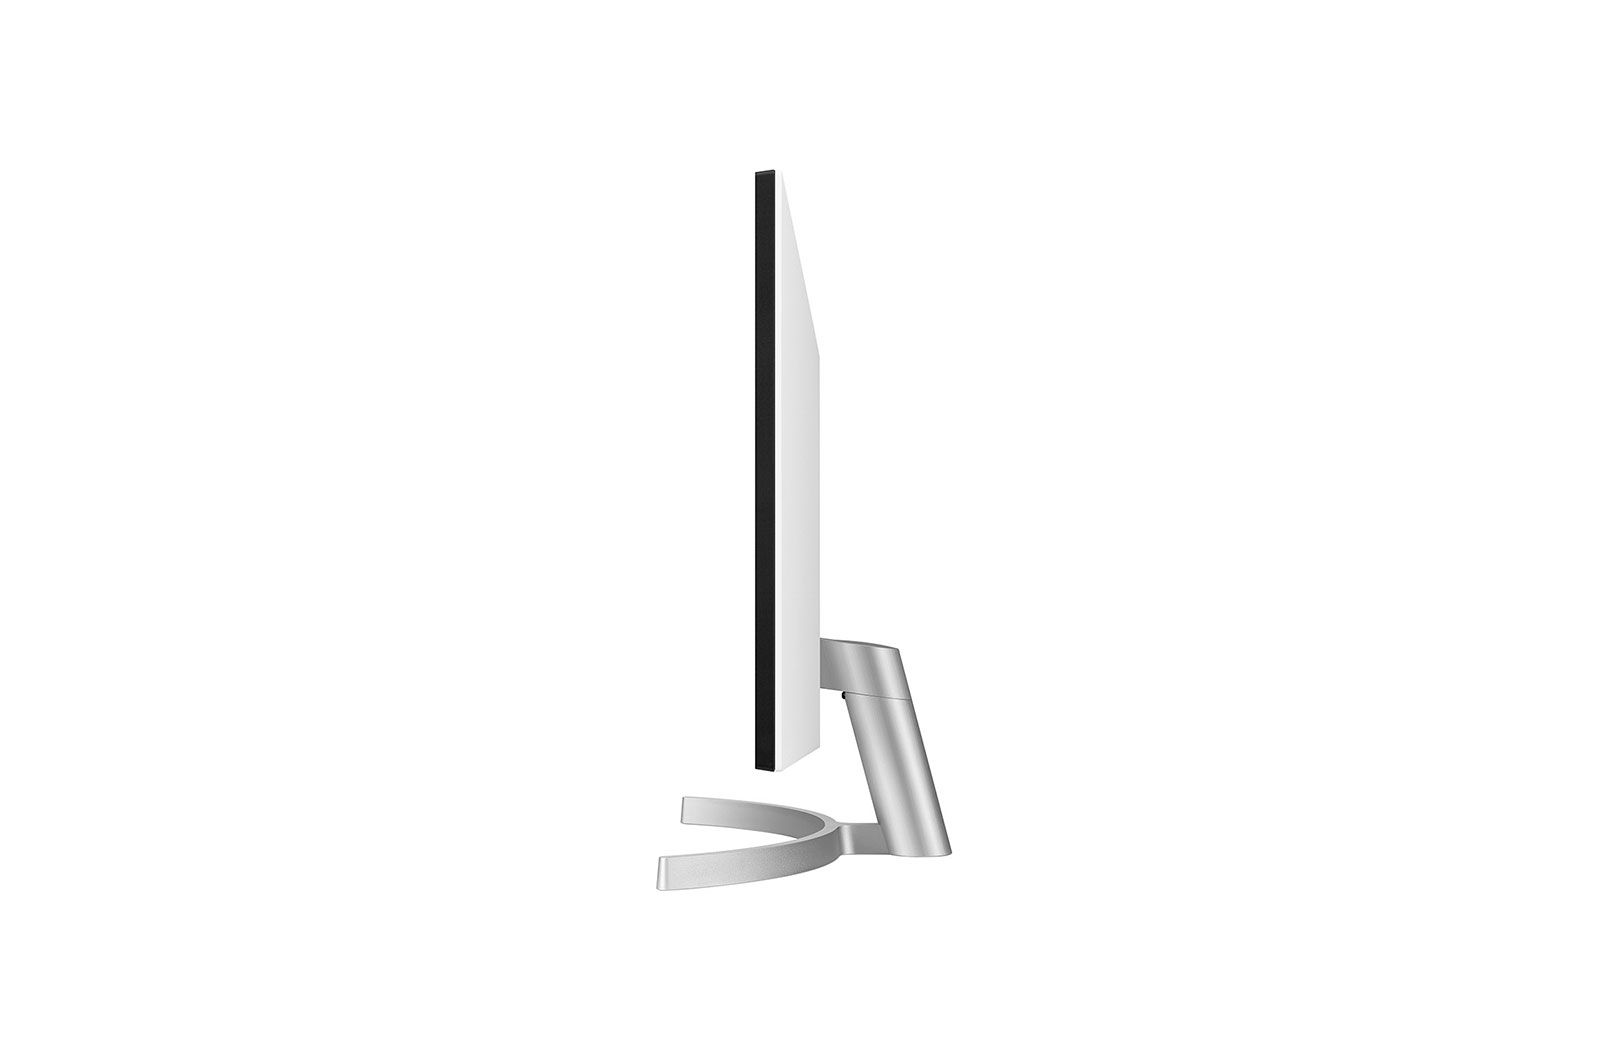 "Monitor 27"" LG ULTRA Widescreen HD 4K IPS HDMI 27UL500"